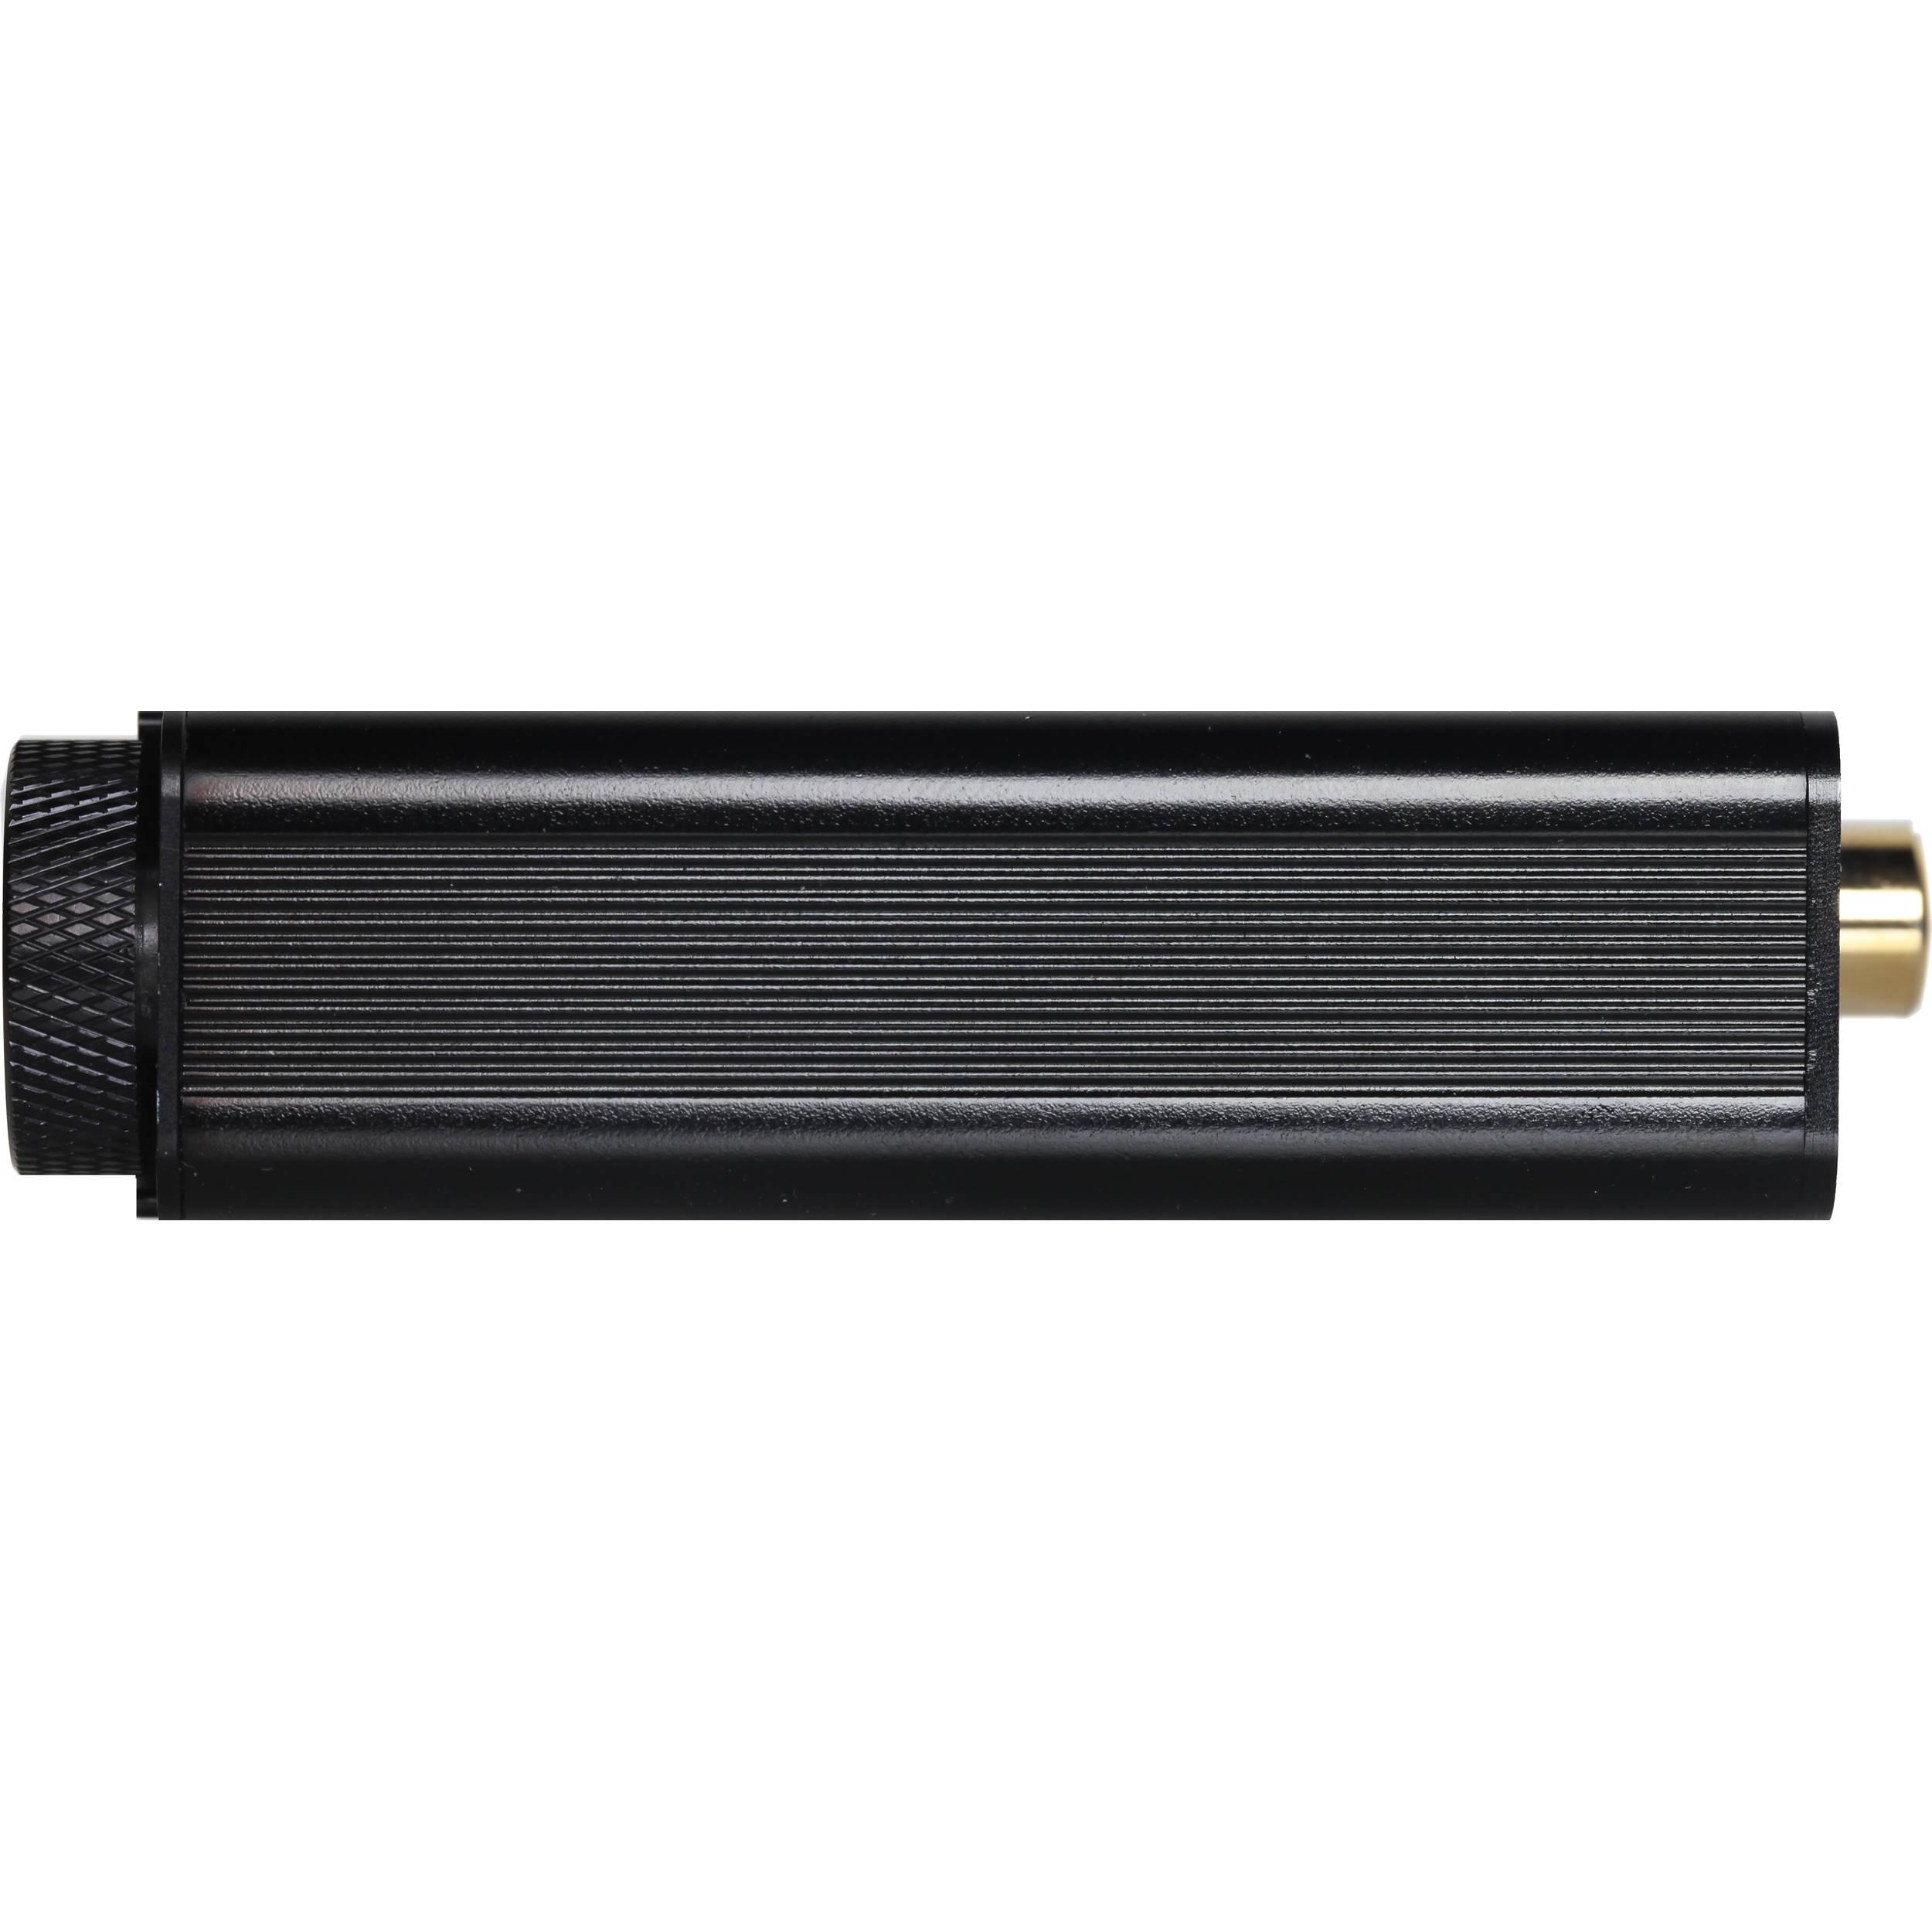 FiiO E10K USB DAC Headphone Amplifier